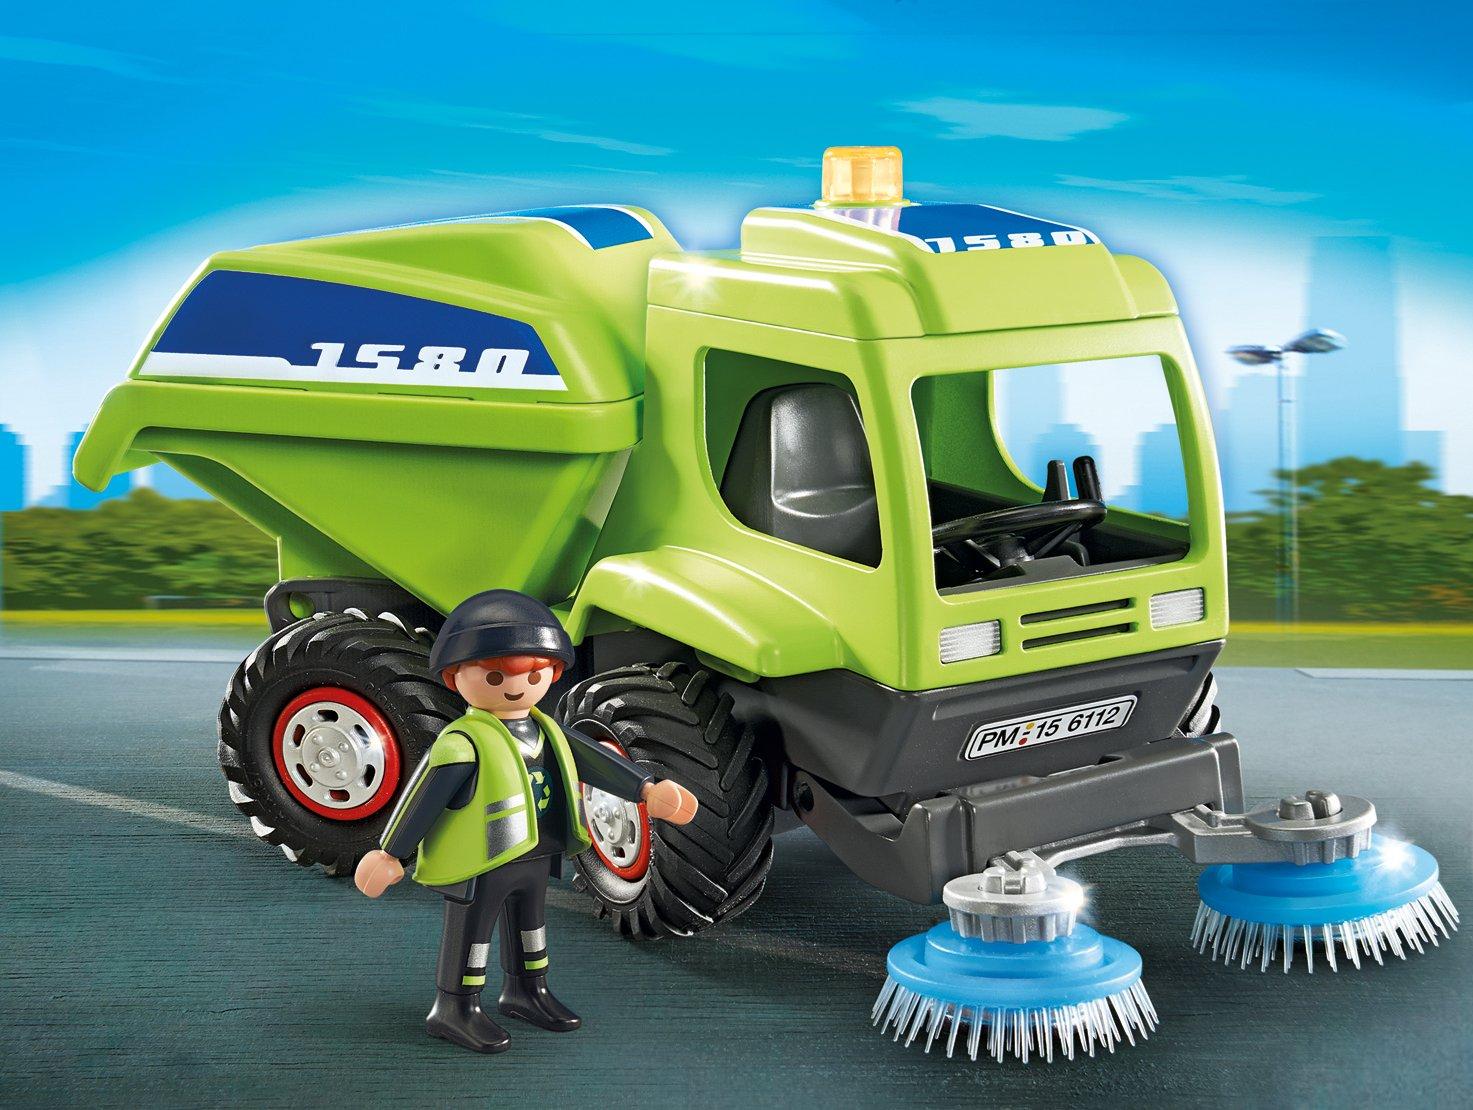 PLAYMOBIL Street Cleaner Playmobil Cranbury 6112